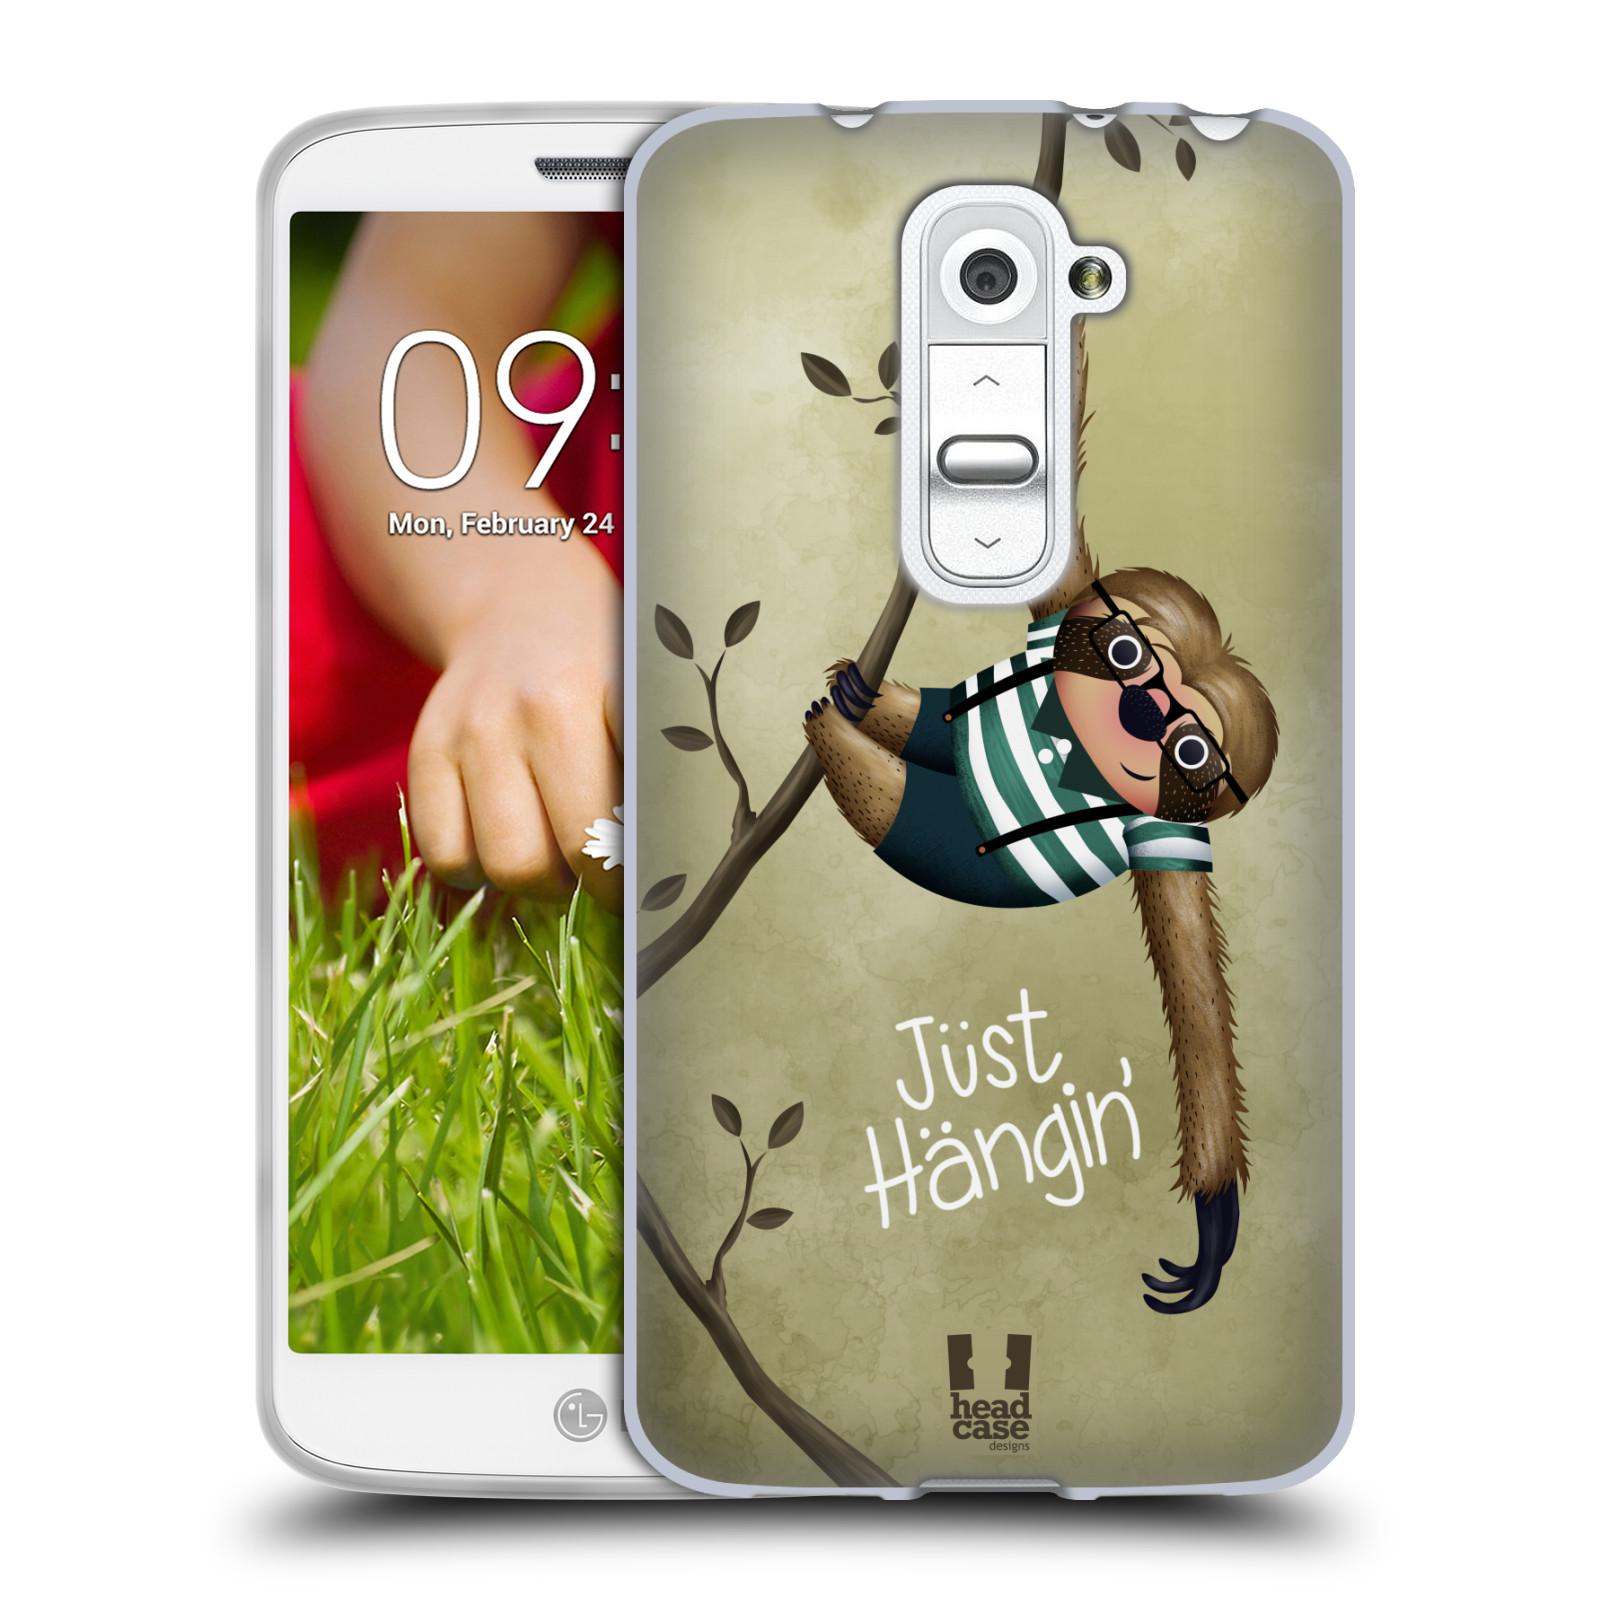 Silikonové pouzdro na mobil LG G2 Mini HEAD CASE Lenochod Just Hangin (Silikonový kryt či obal na mobilní telefon LG G2 Mini D620)